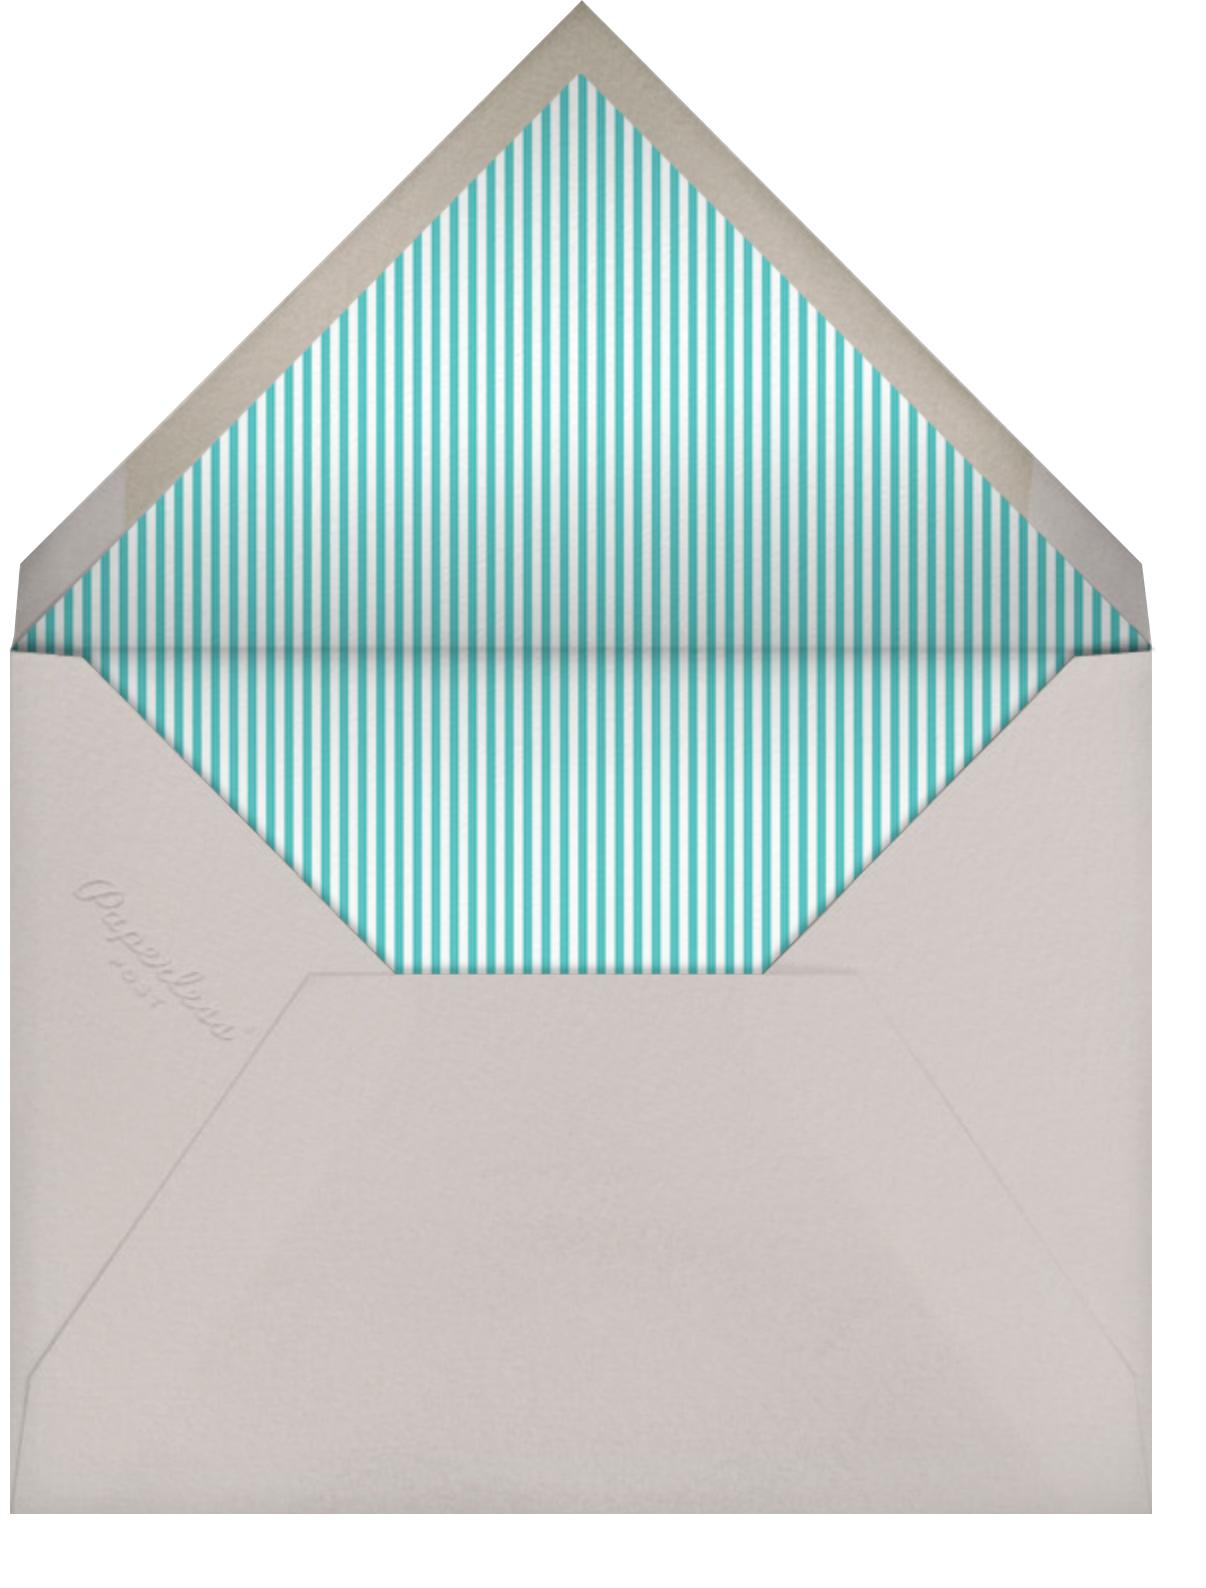 Little Heart Halo (Stationery) - Pink - Little Cube - Kids' stationery - envelope back